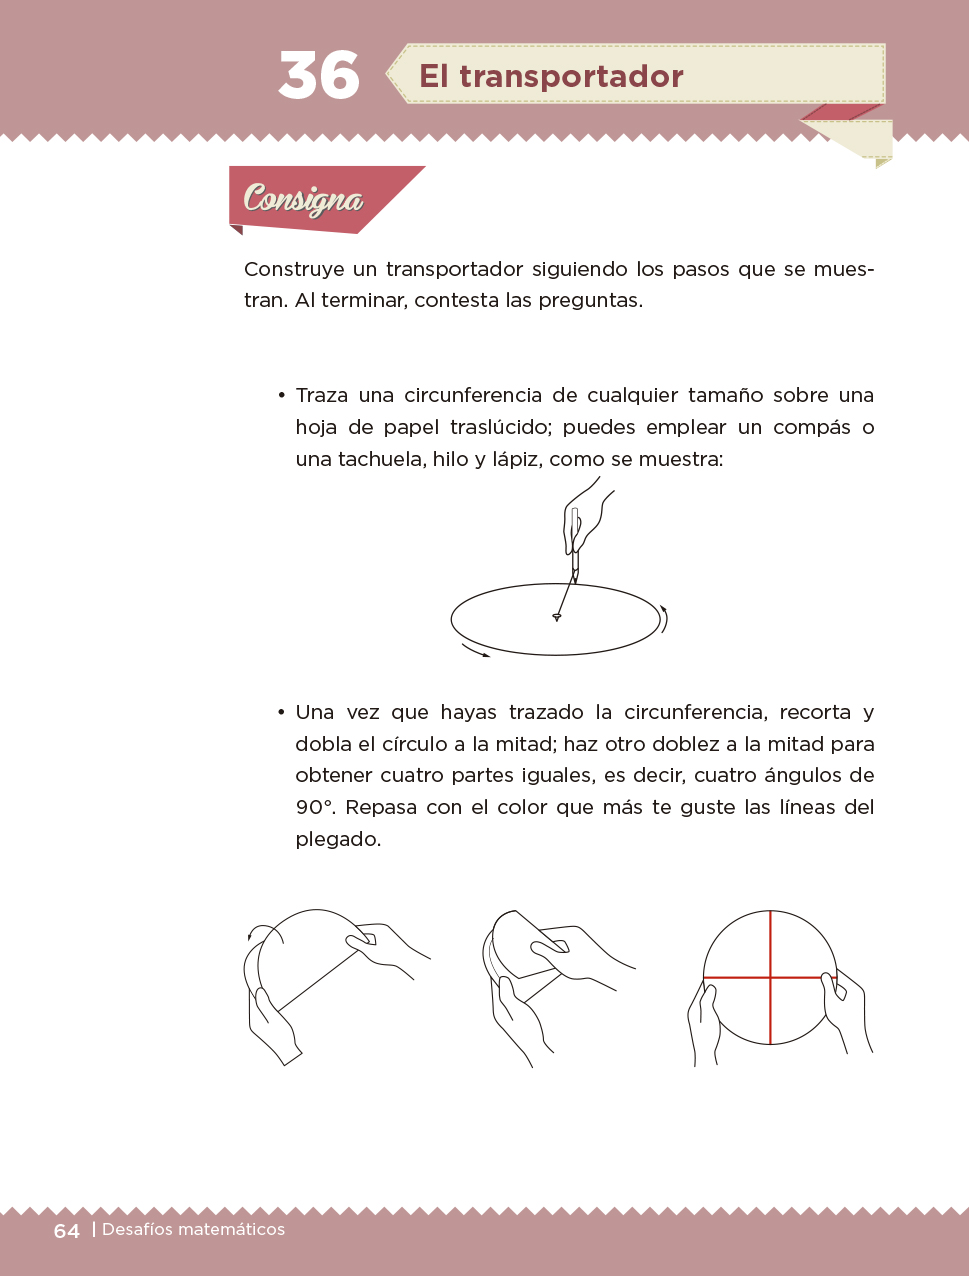 Desafíos Matemáticos Cuarto grado 2017-2018 - Ciclo Escolar - Centro ...